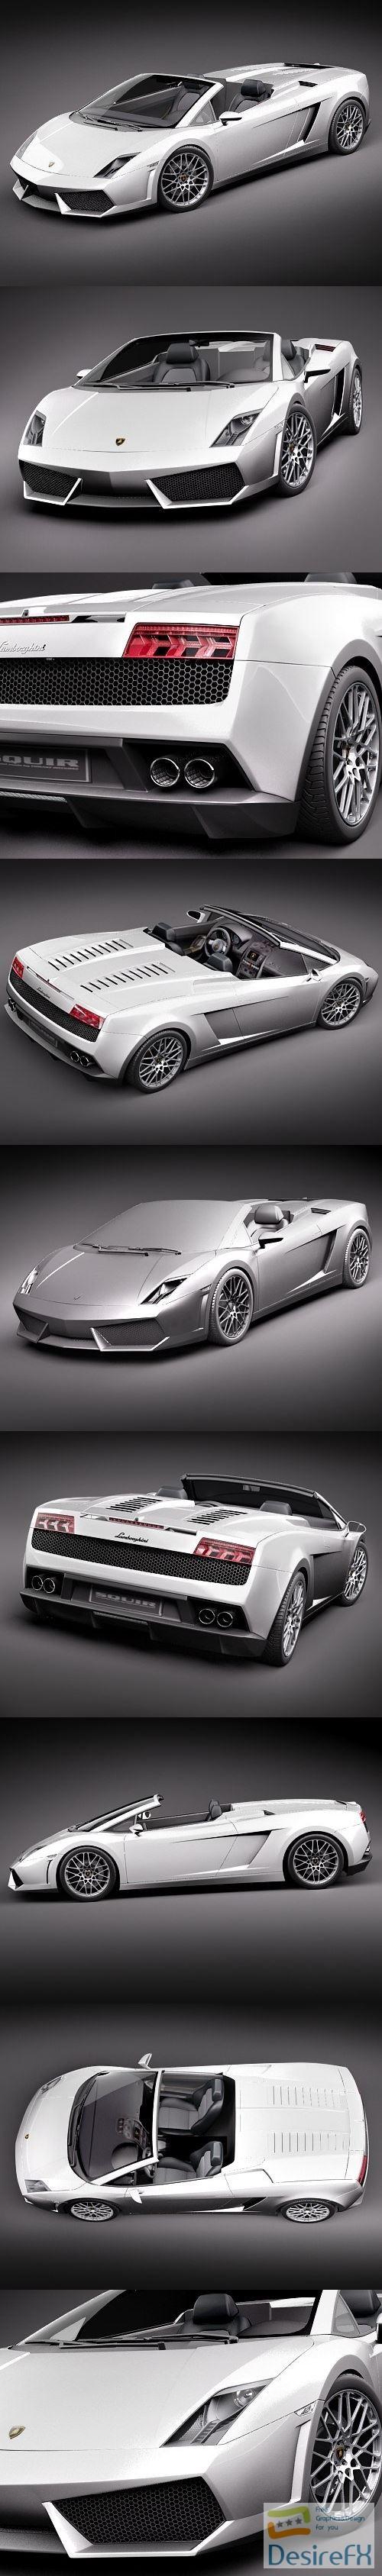 3d-models - Lamborghini Gallardo LP560-4 Spyder 3D Model